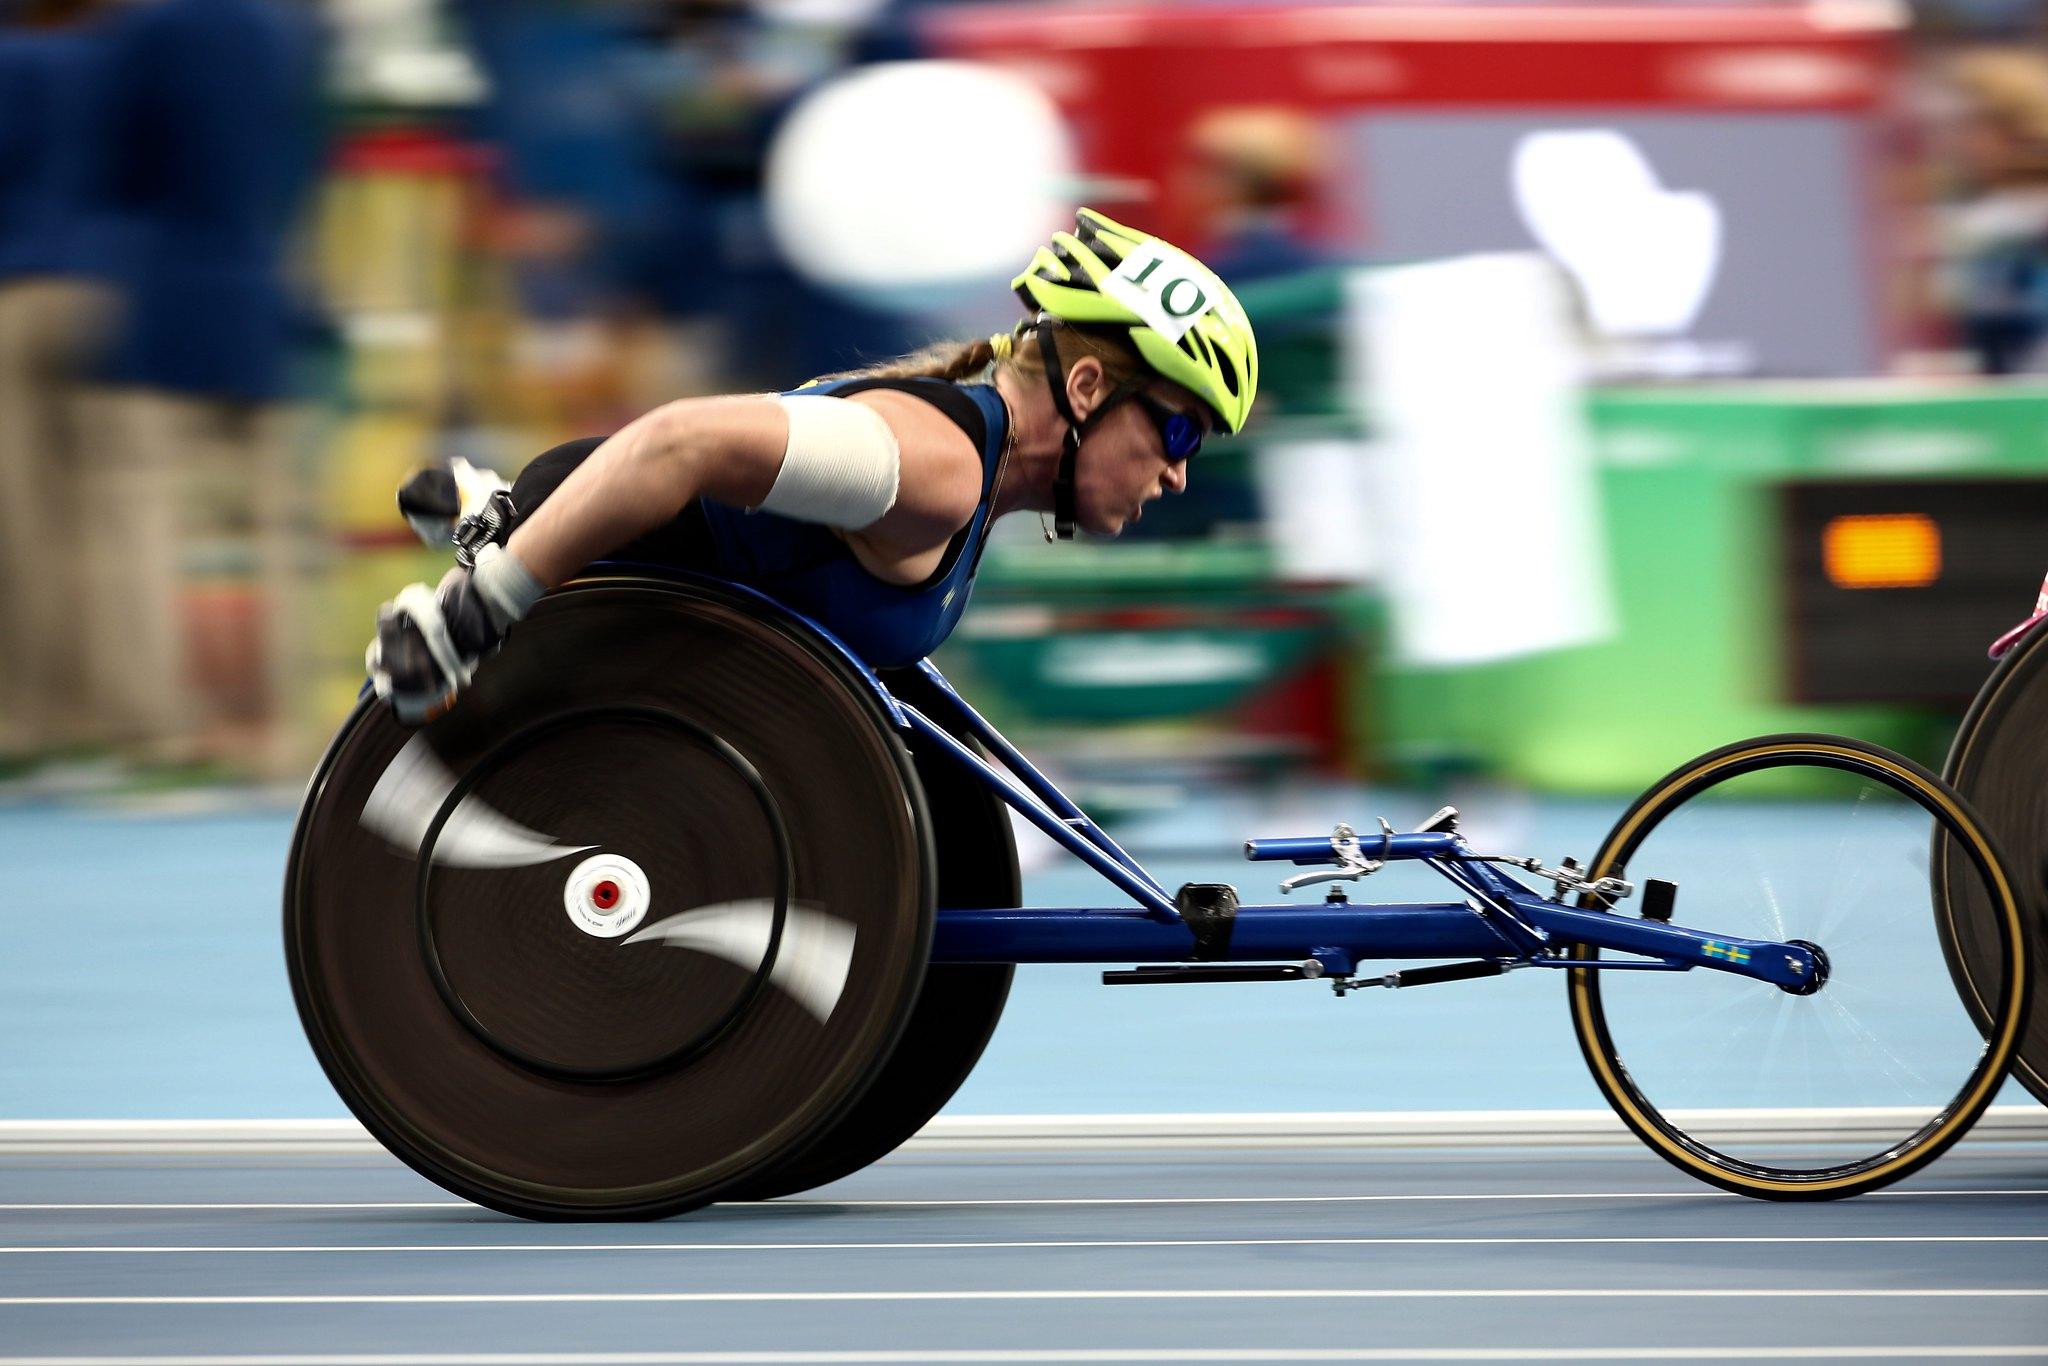 Gunilla Wallengren - Athletics - Women´s 1500m T54 FINAL - Paralympics Rio 2016